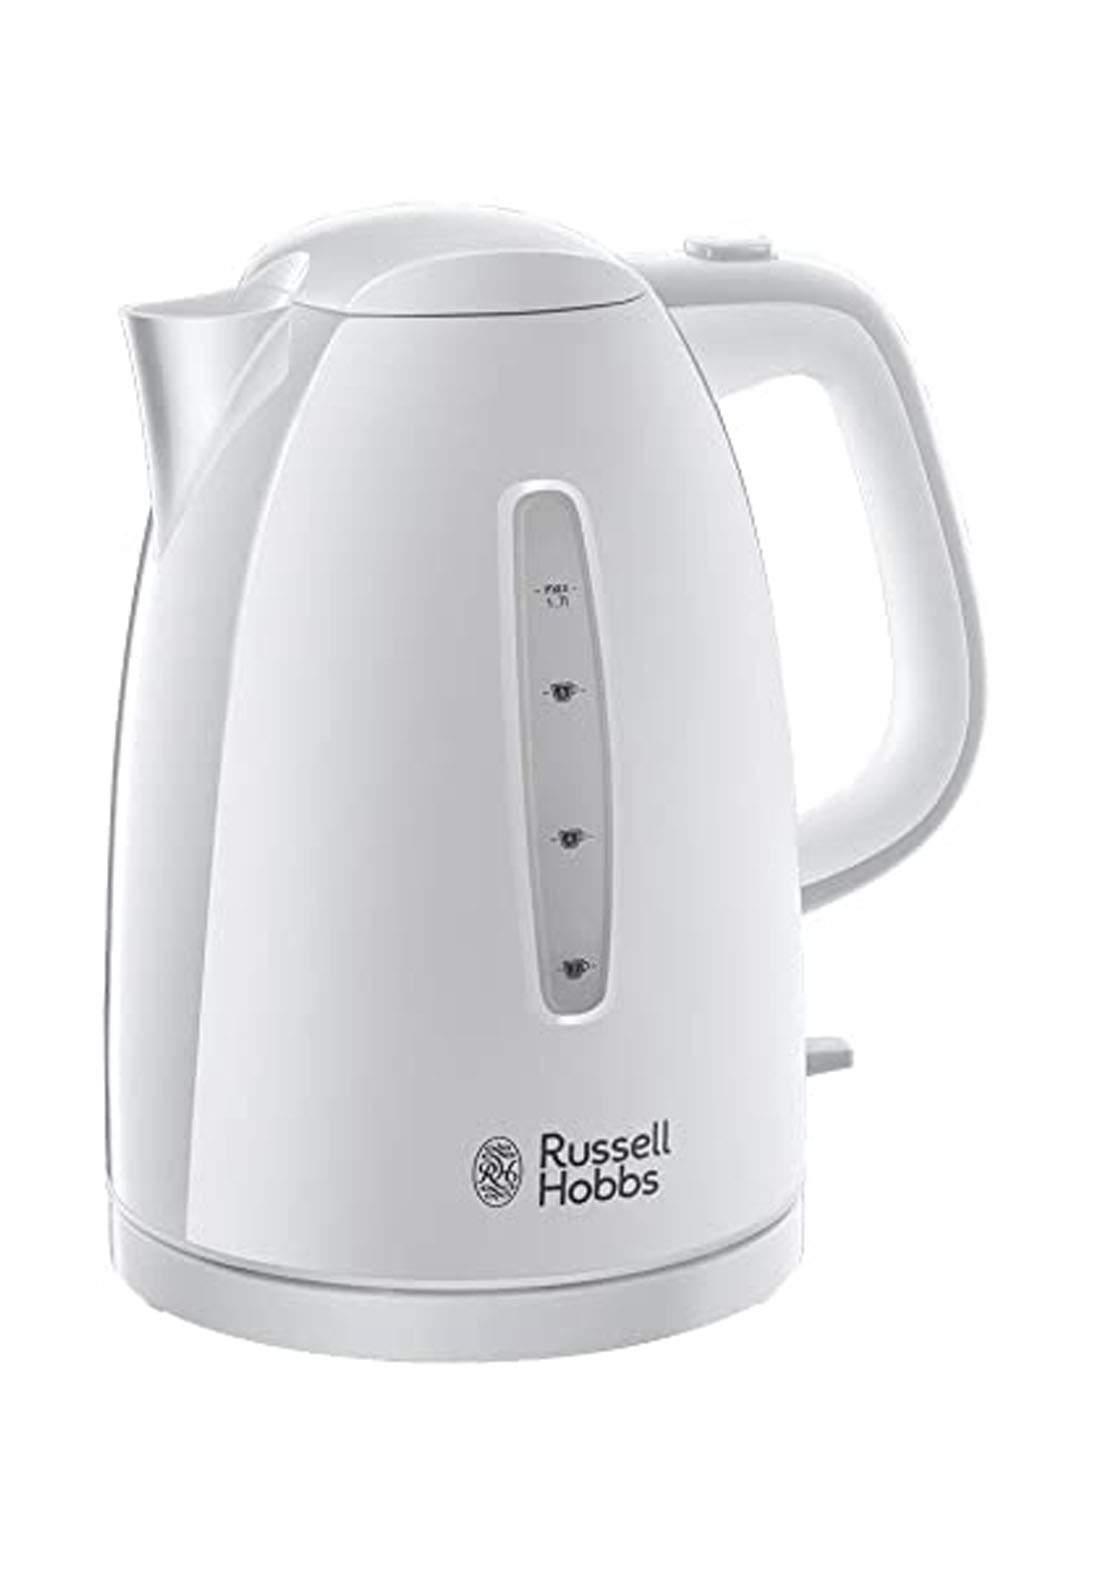 Russell hobbs 21270 Electrical kettle  غلاية